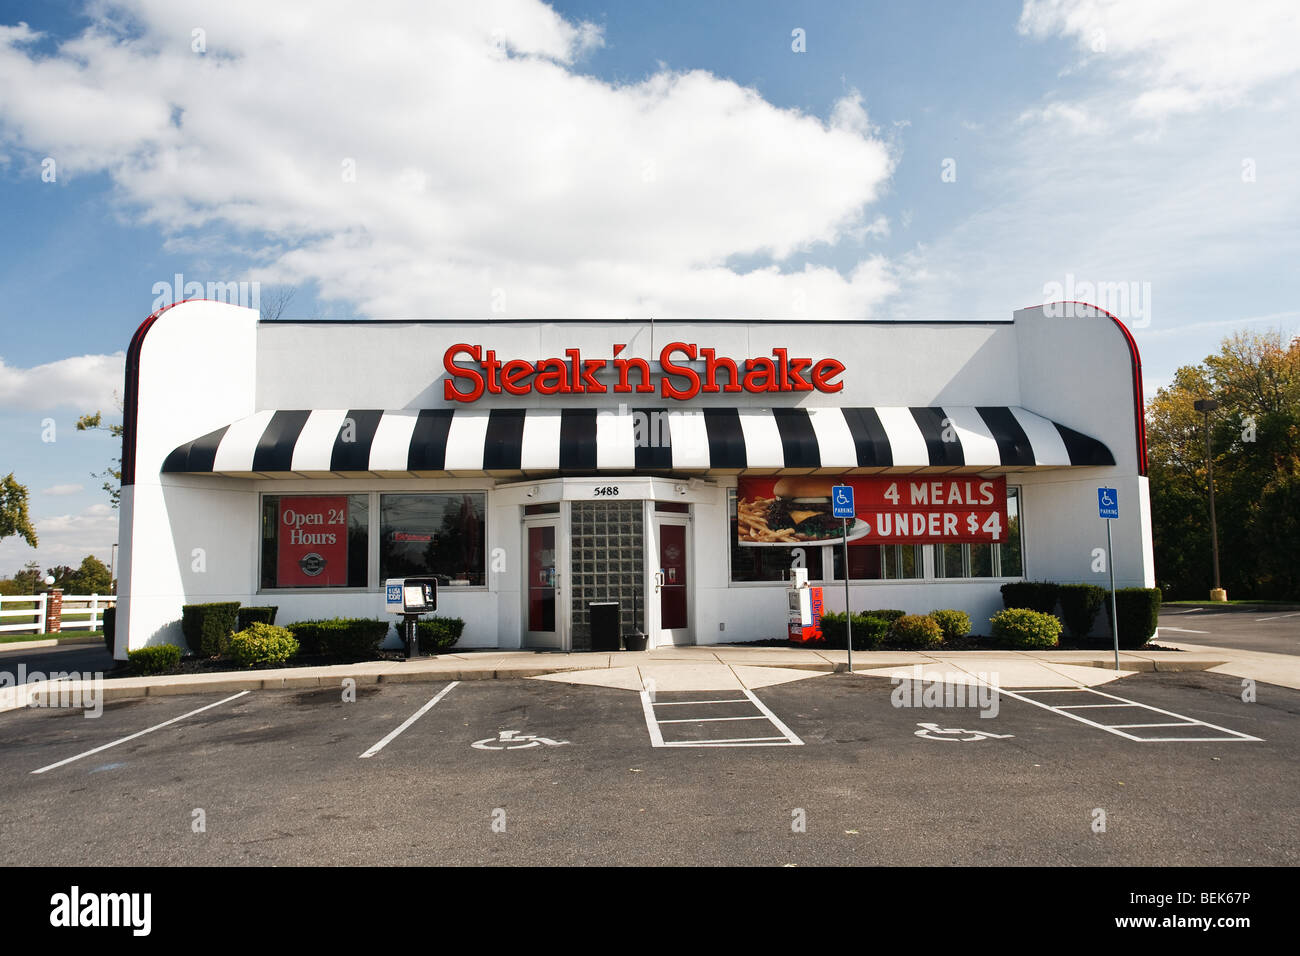 Steak N Shake Restaurant Stock Photo 26237562 Alamy